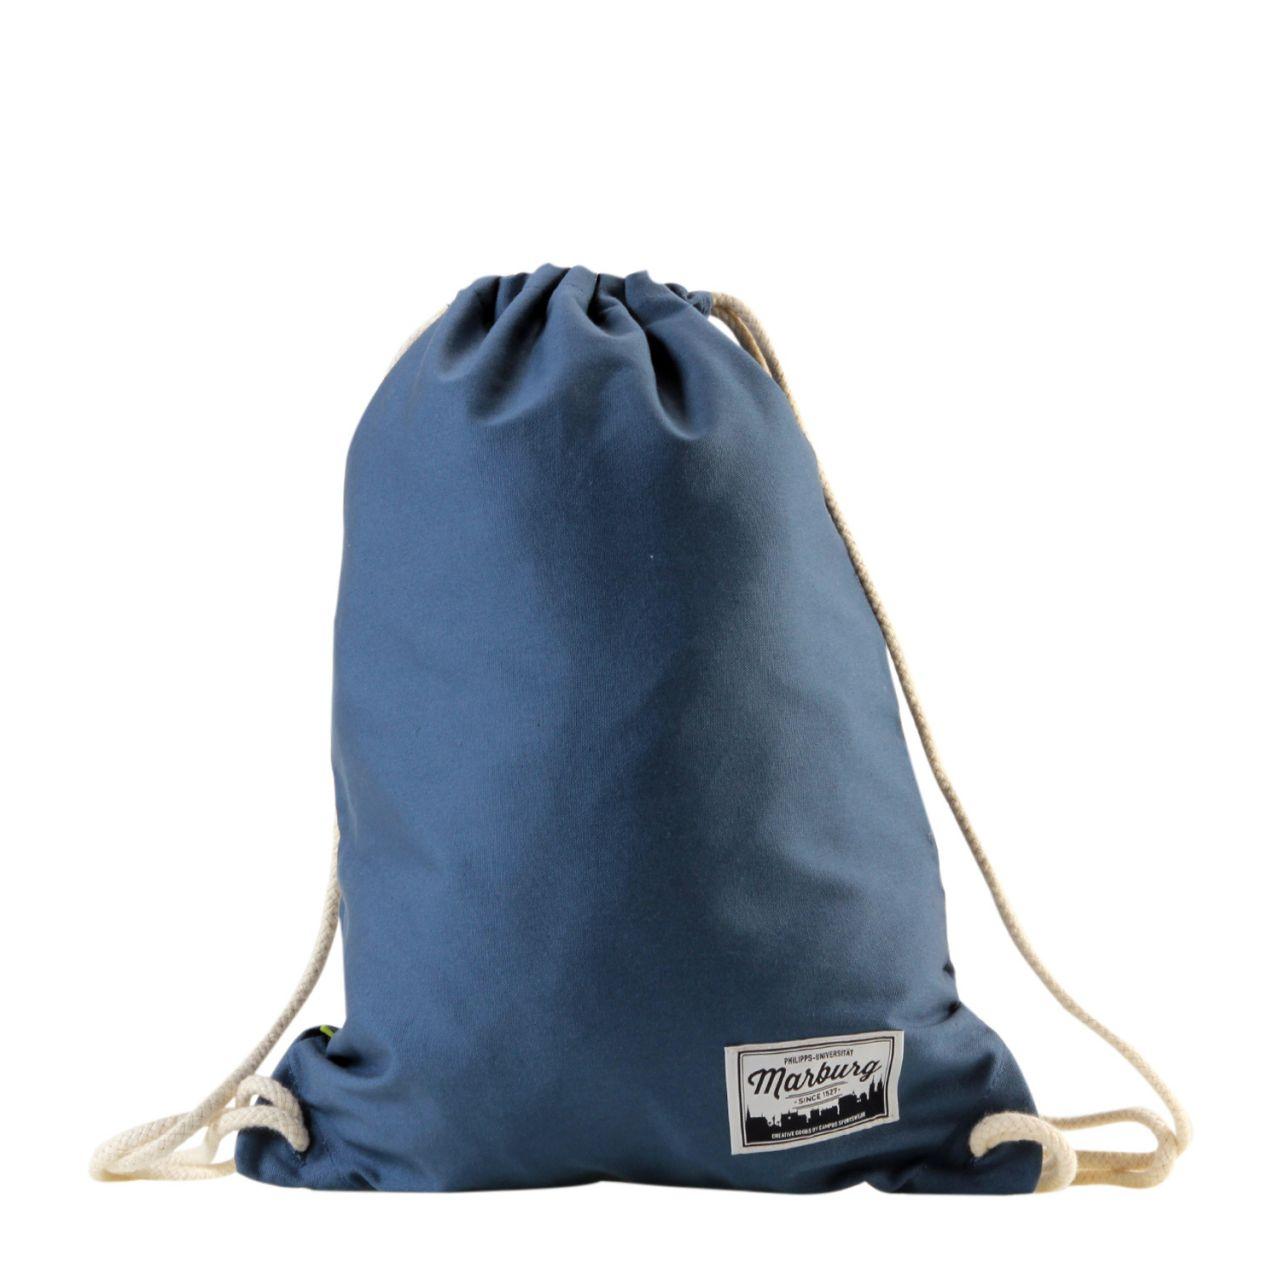 Organic Gymbag, airforce blue, label